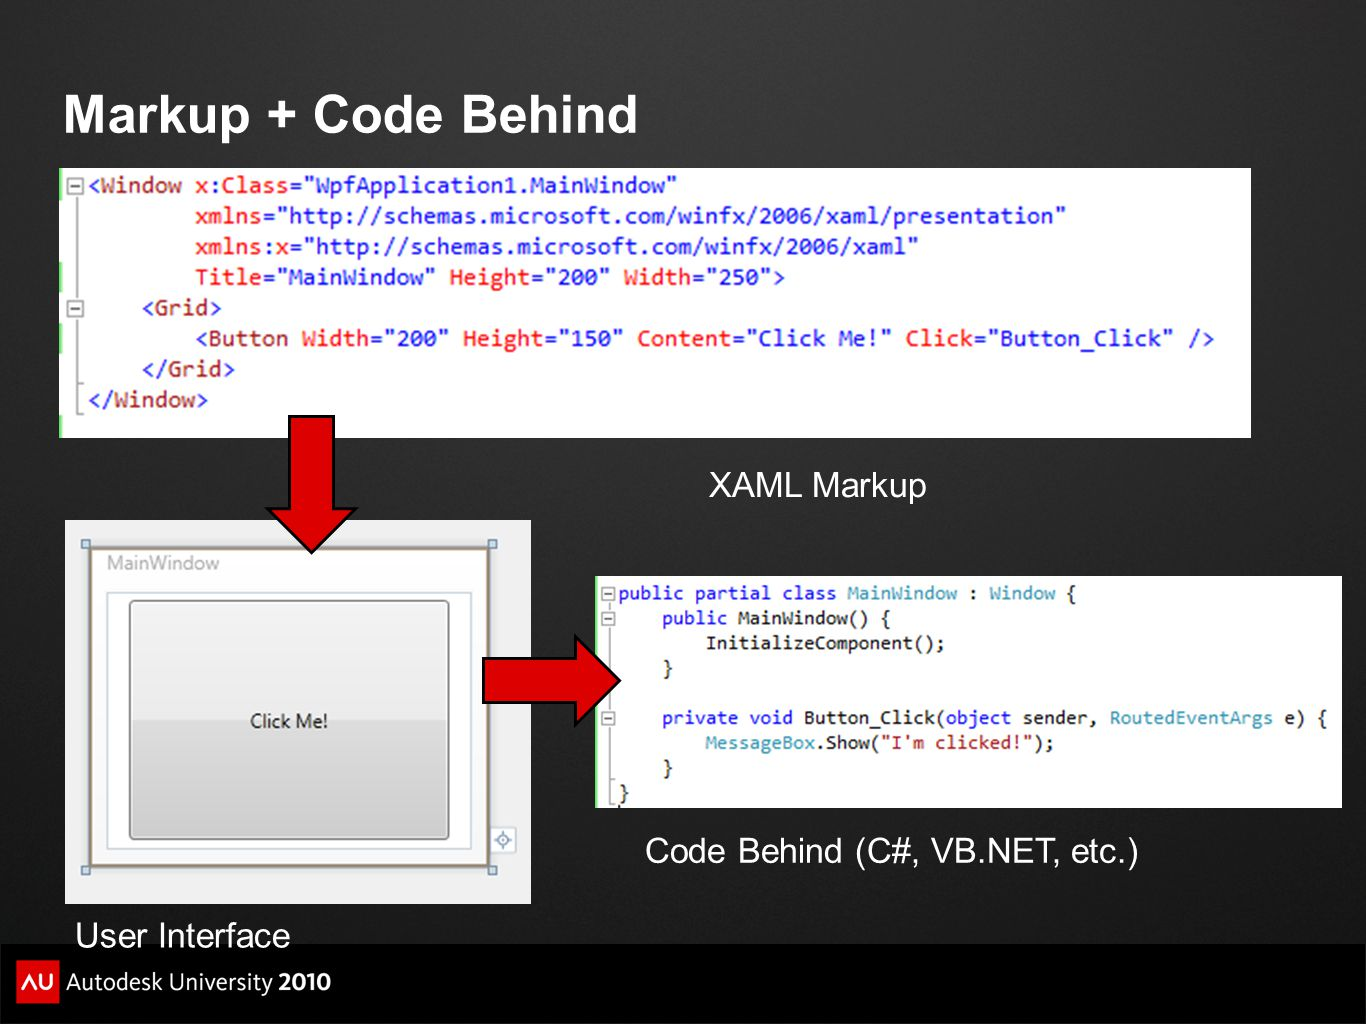 Markup + Code Behind XAML Markup Code Behind (C#, VB.NET, etc.)